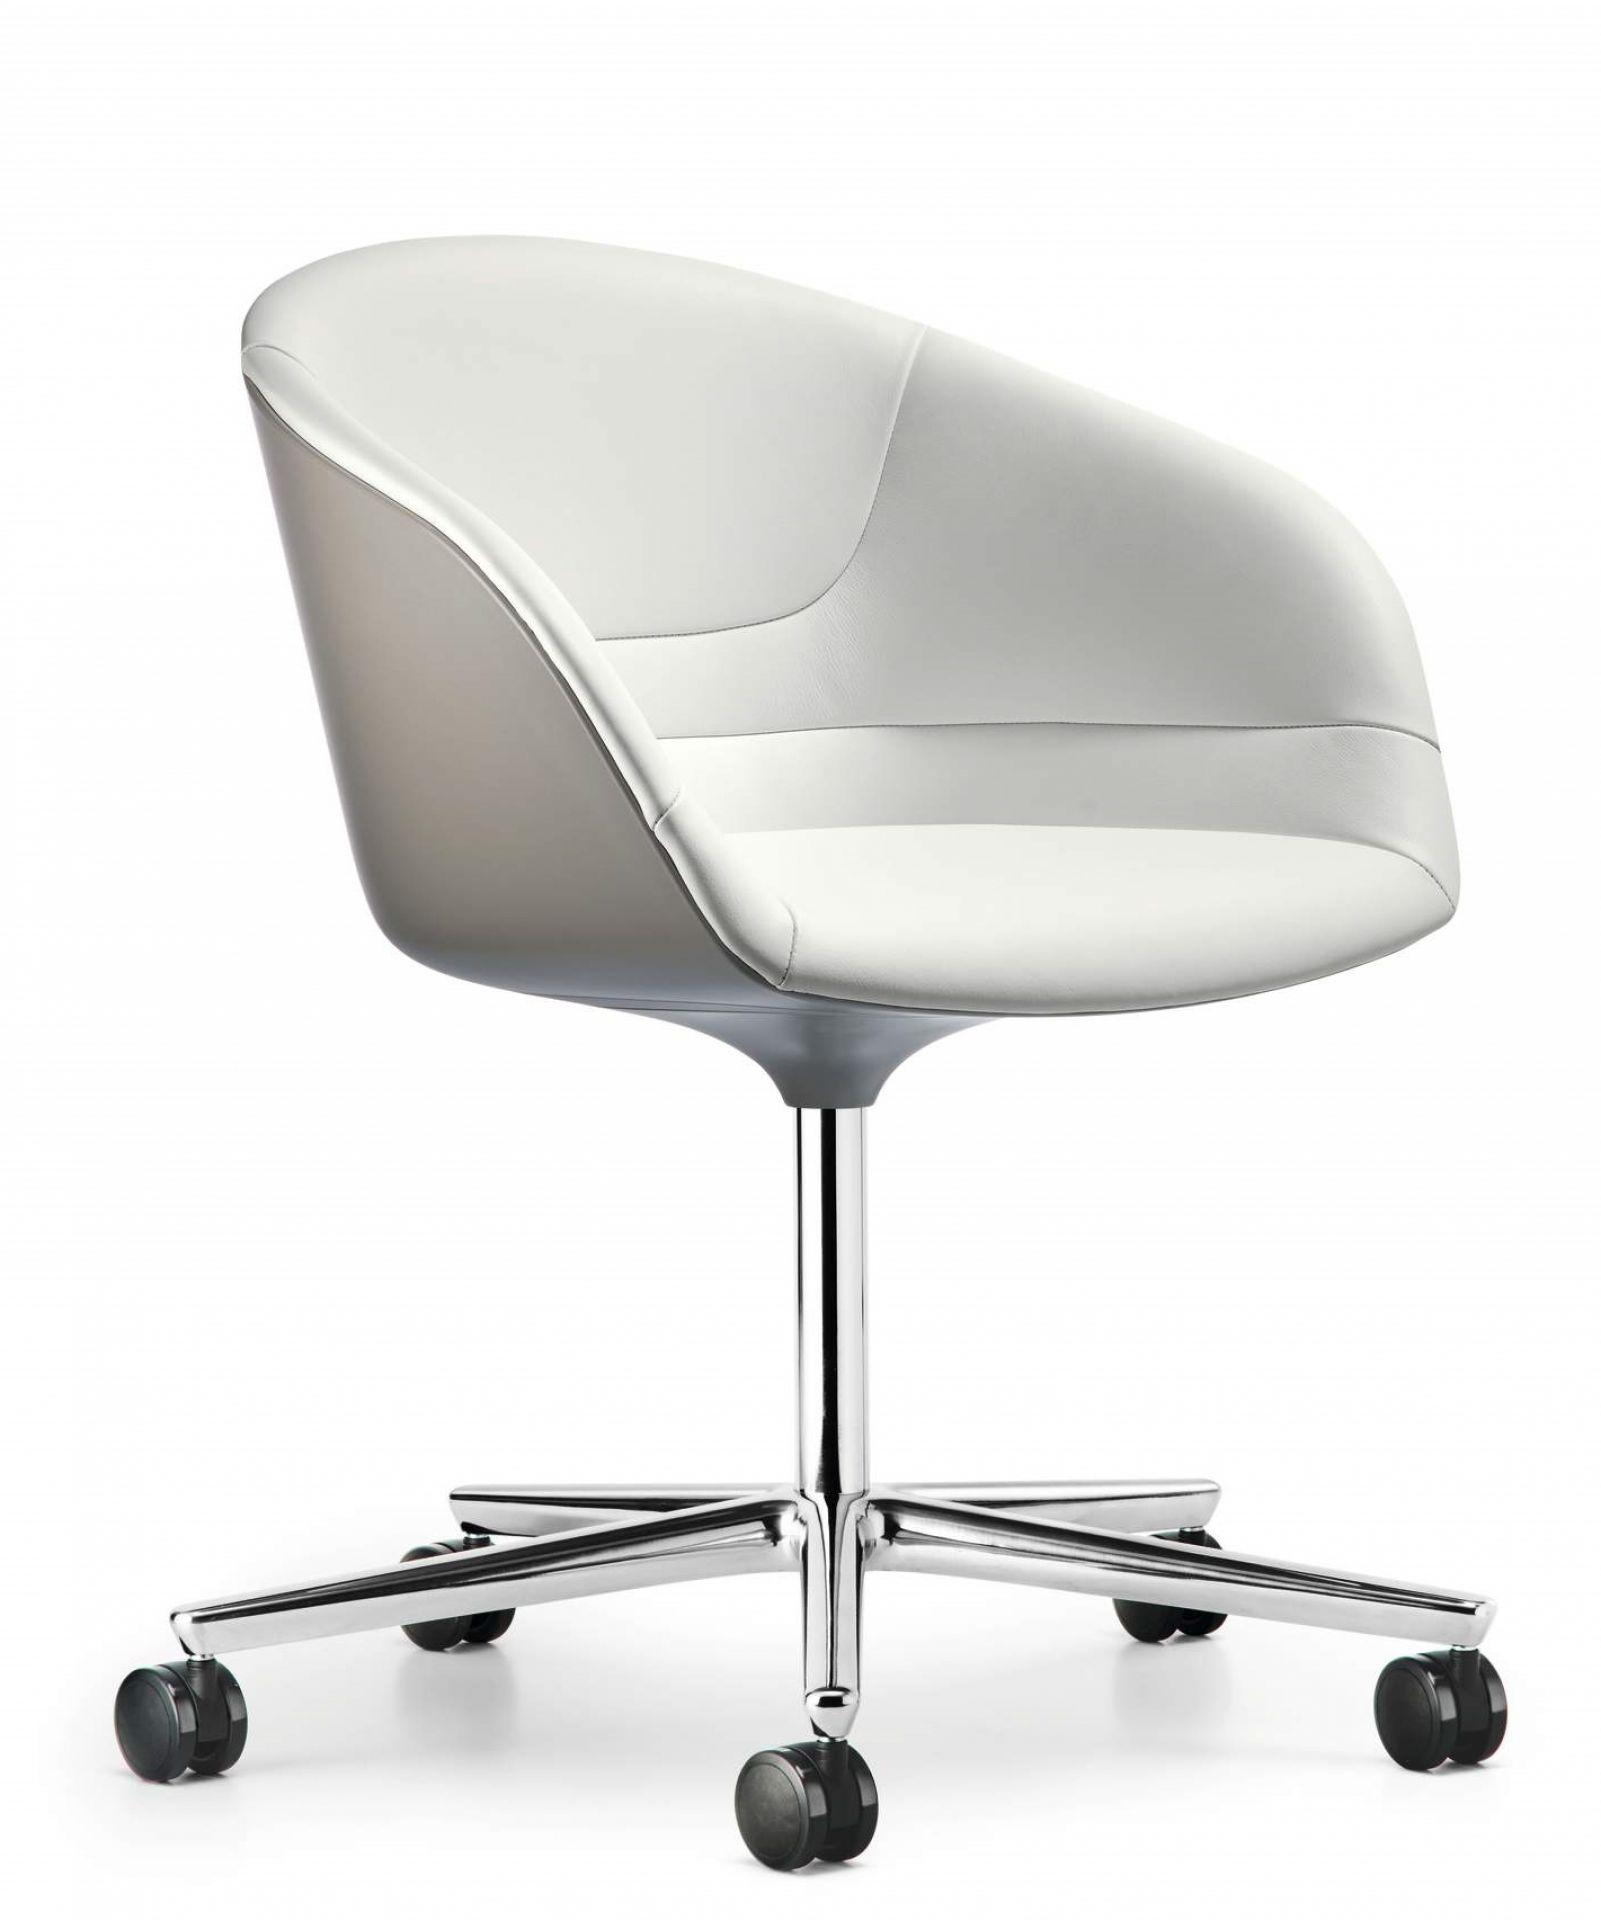 Kyo Armchair / Swivel chairWalter Knoll